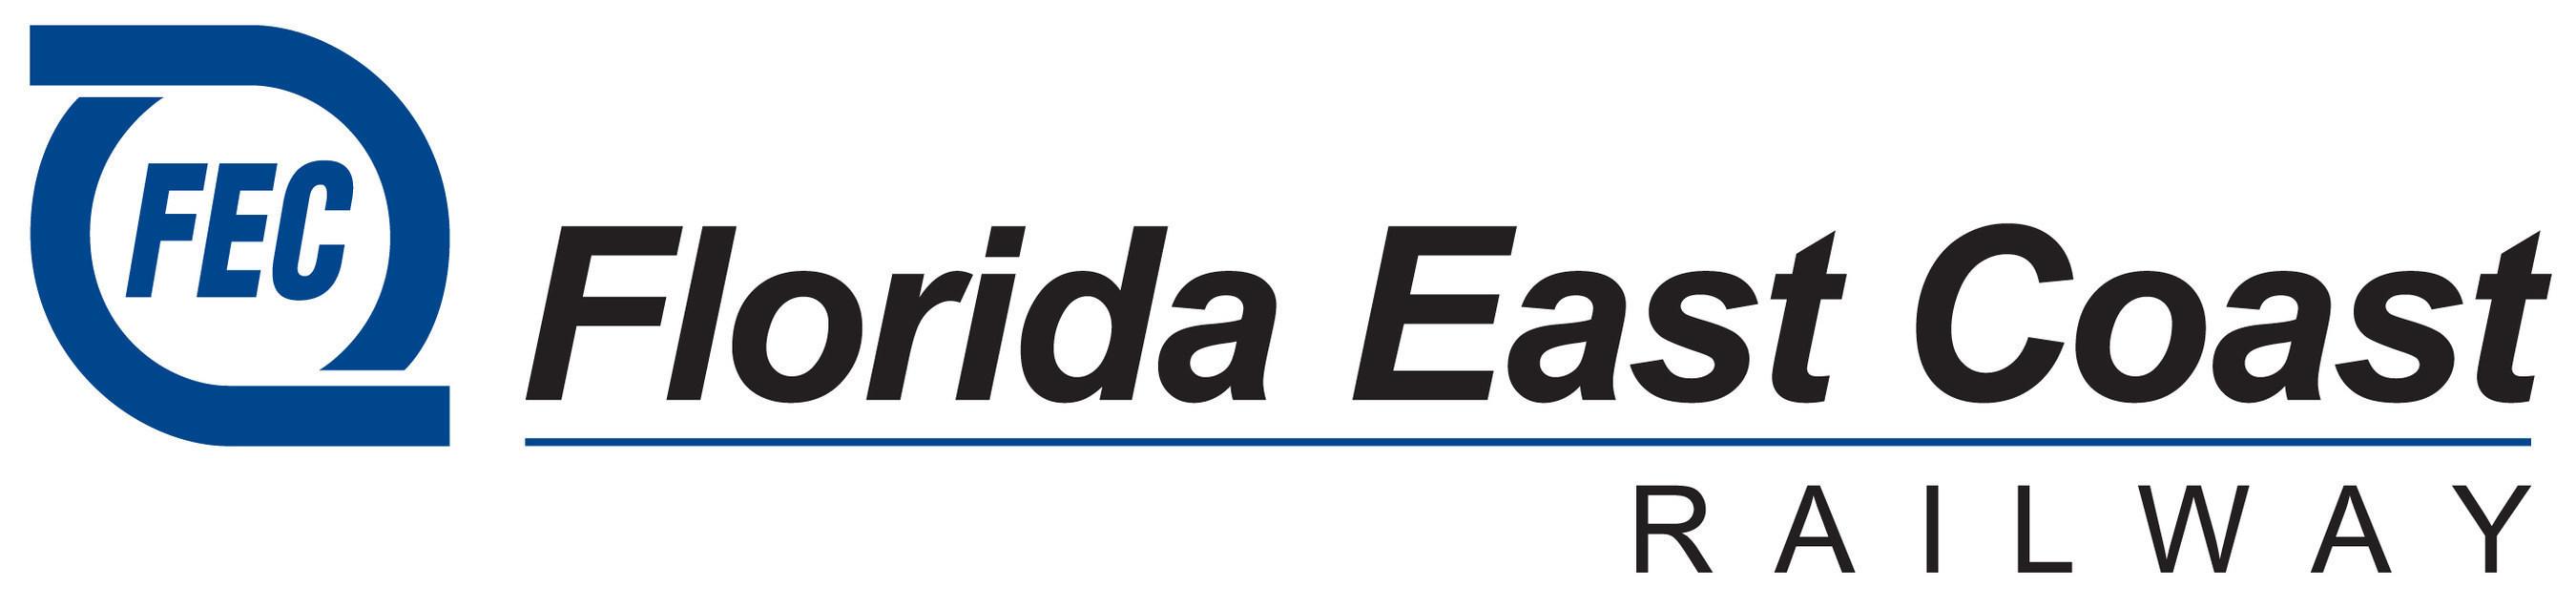 Florida East Coast Railway Logo.